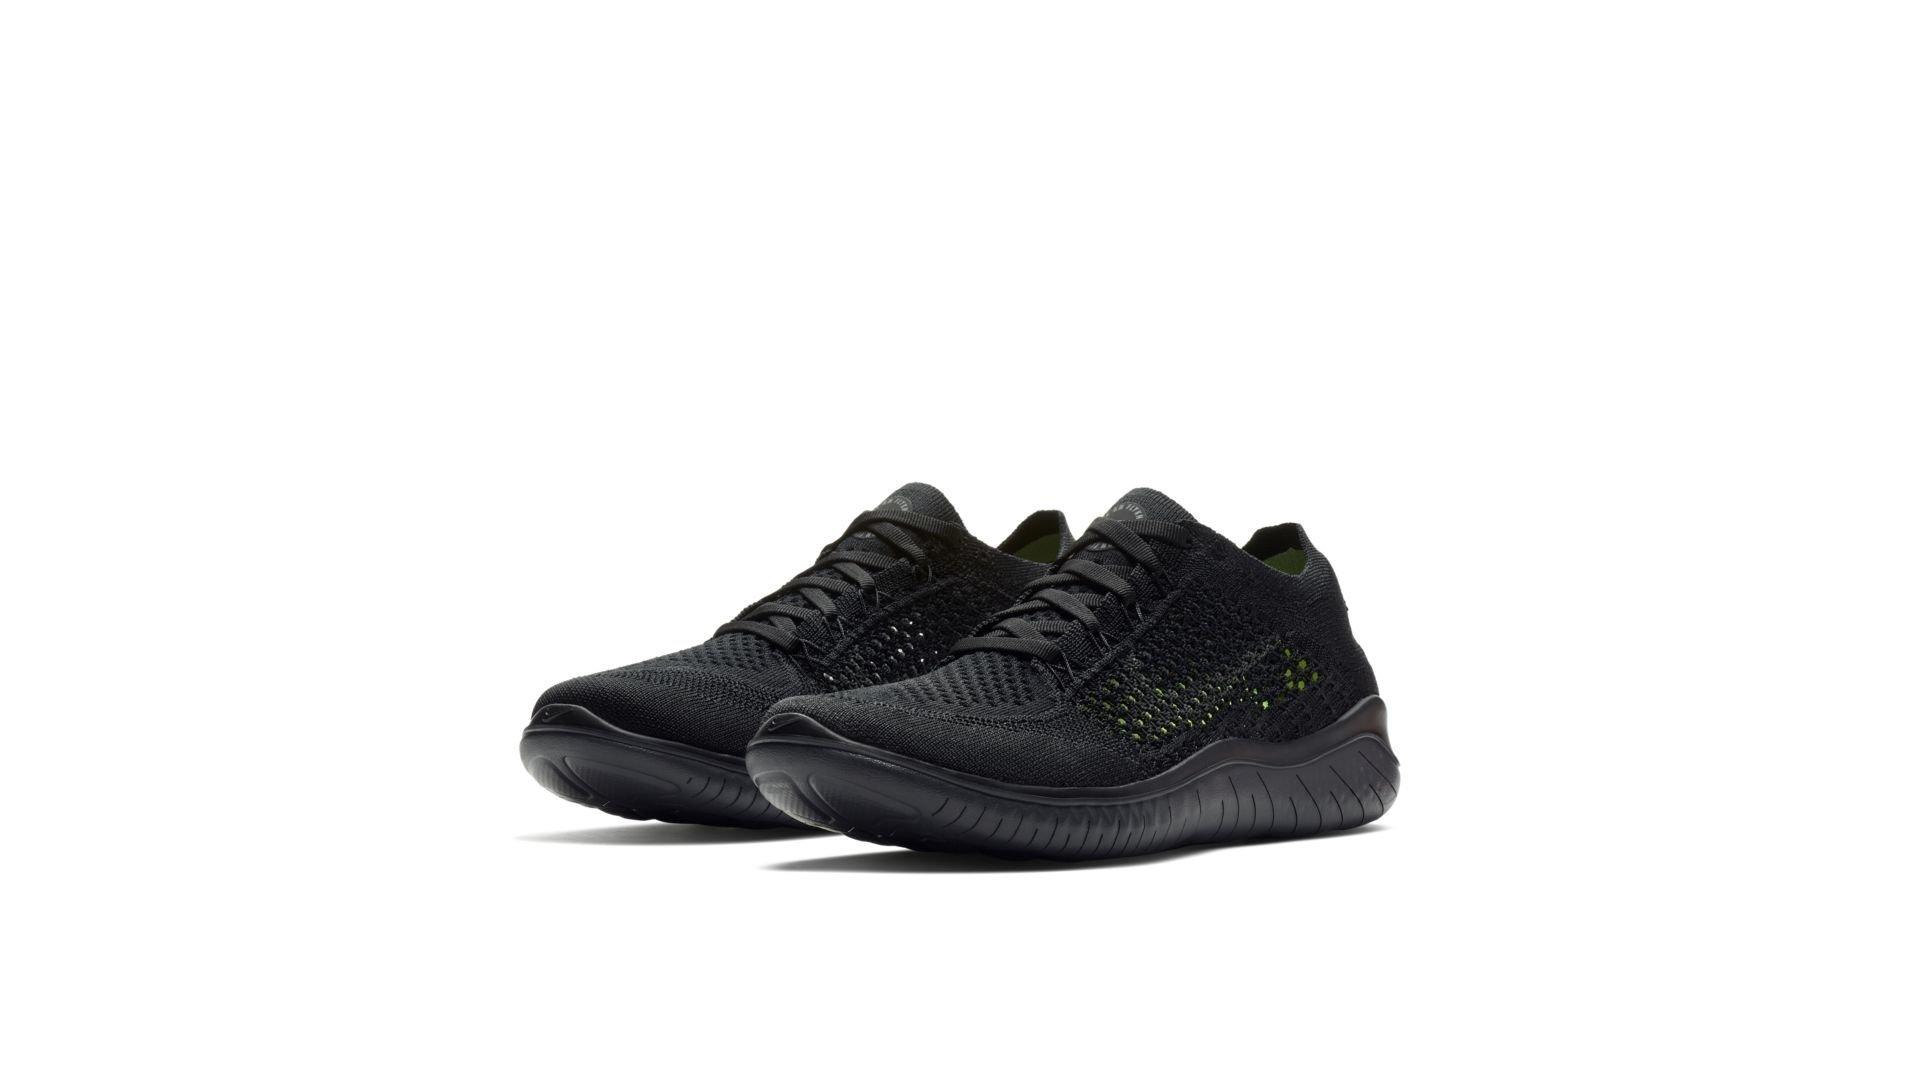 Nike Free RN Flyknit 2018 Black Anthracite (W) (942839-002)